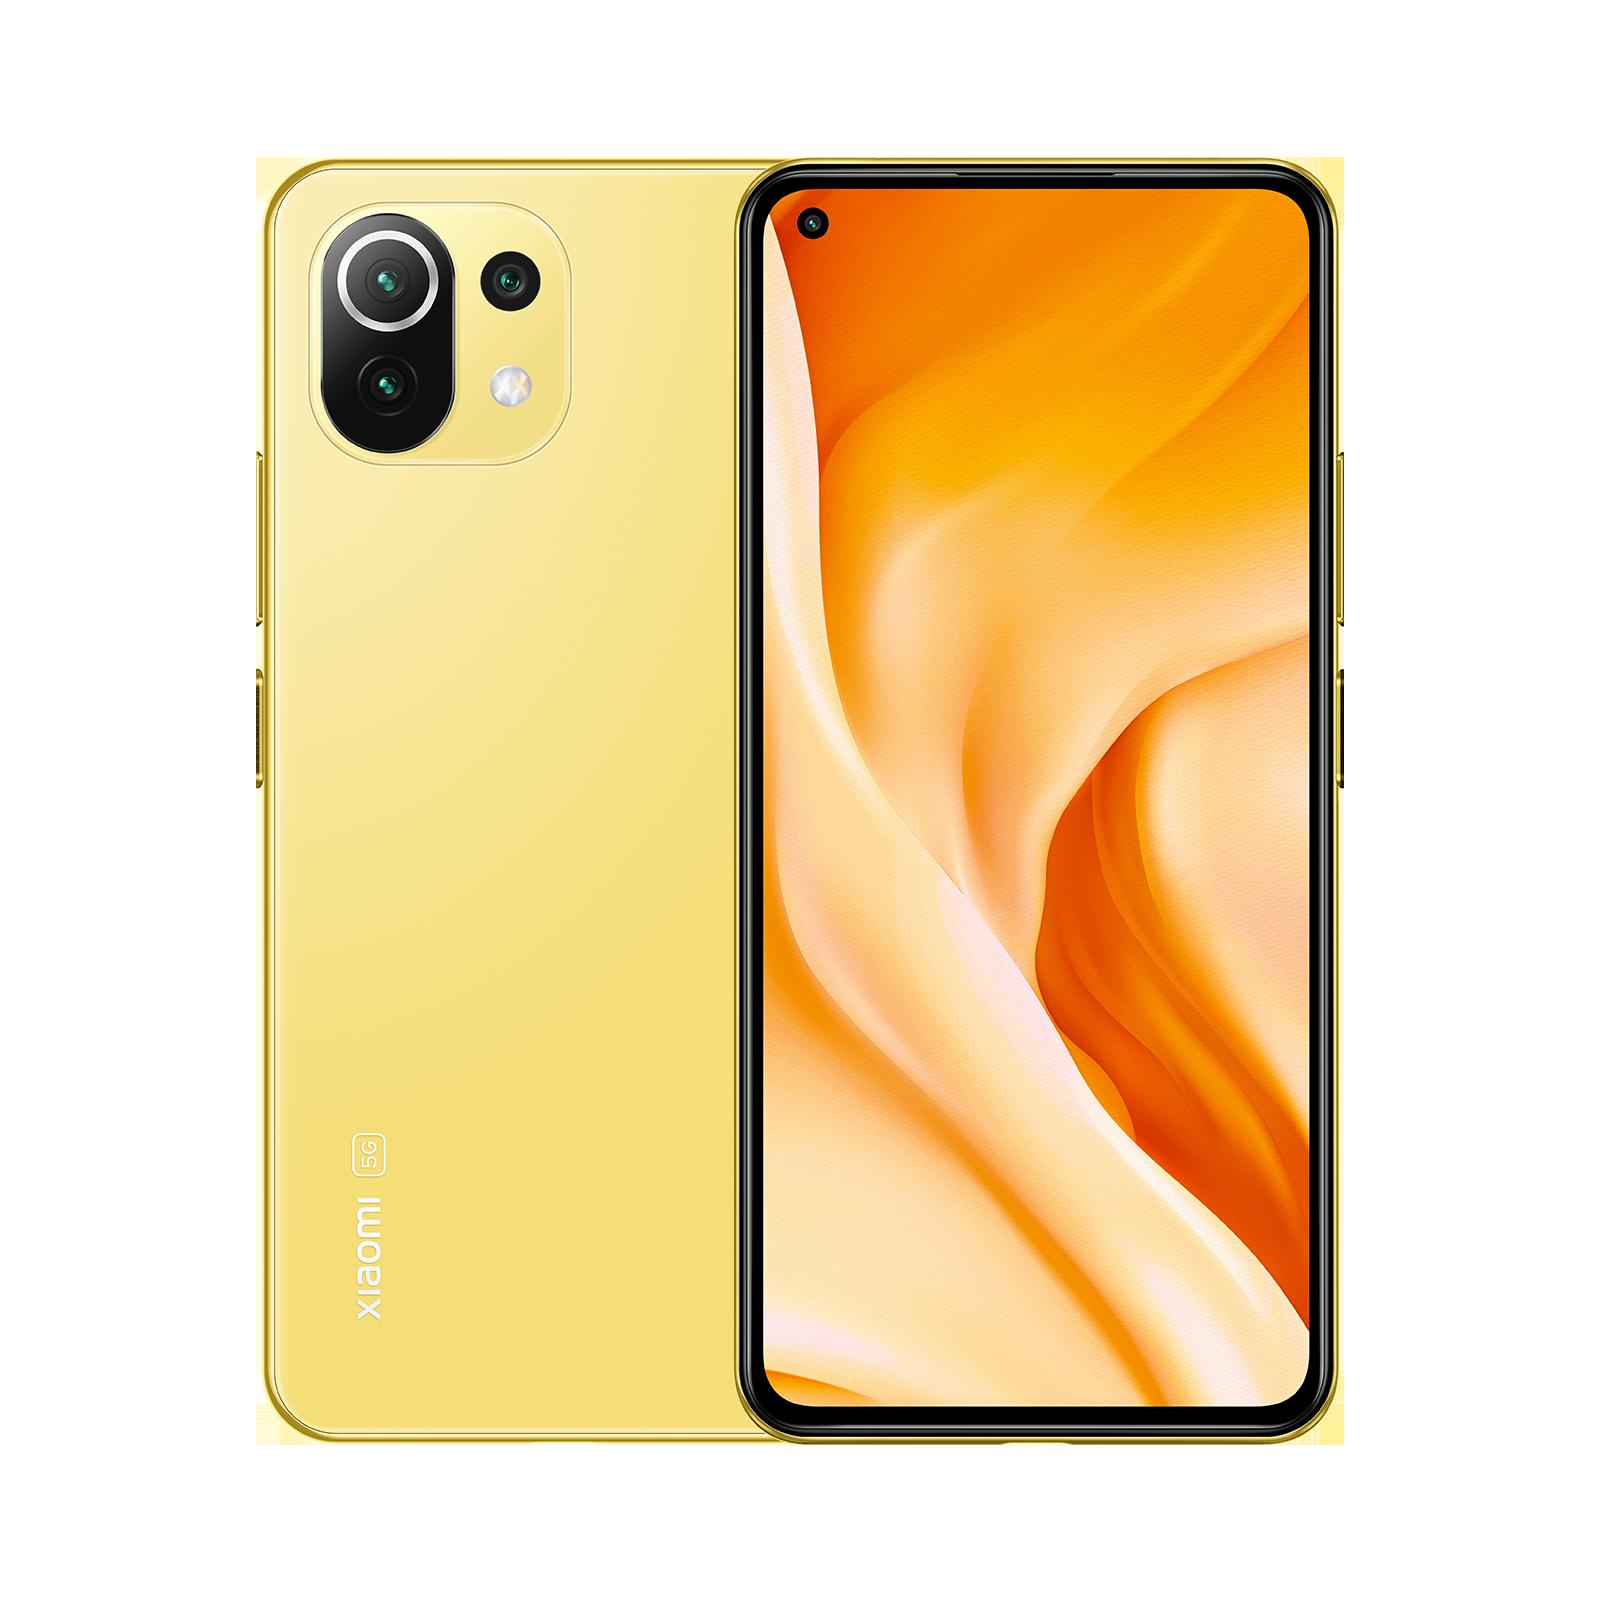 Global Version Xiaomi Mi 11 Lite 5G Smartphone RAM6GB+ ROM128GB Snapdragon 780G AMOLED Full Screen 64MP 4250mAh Battery With NFC enlarge